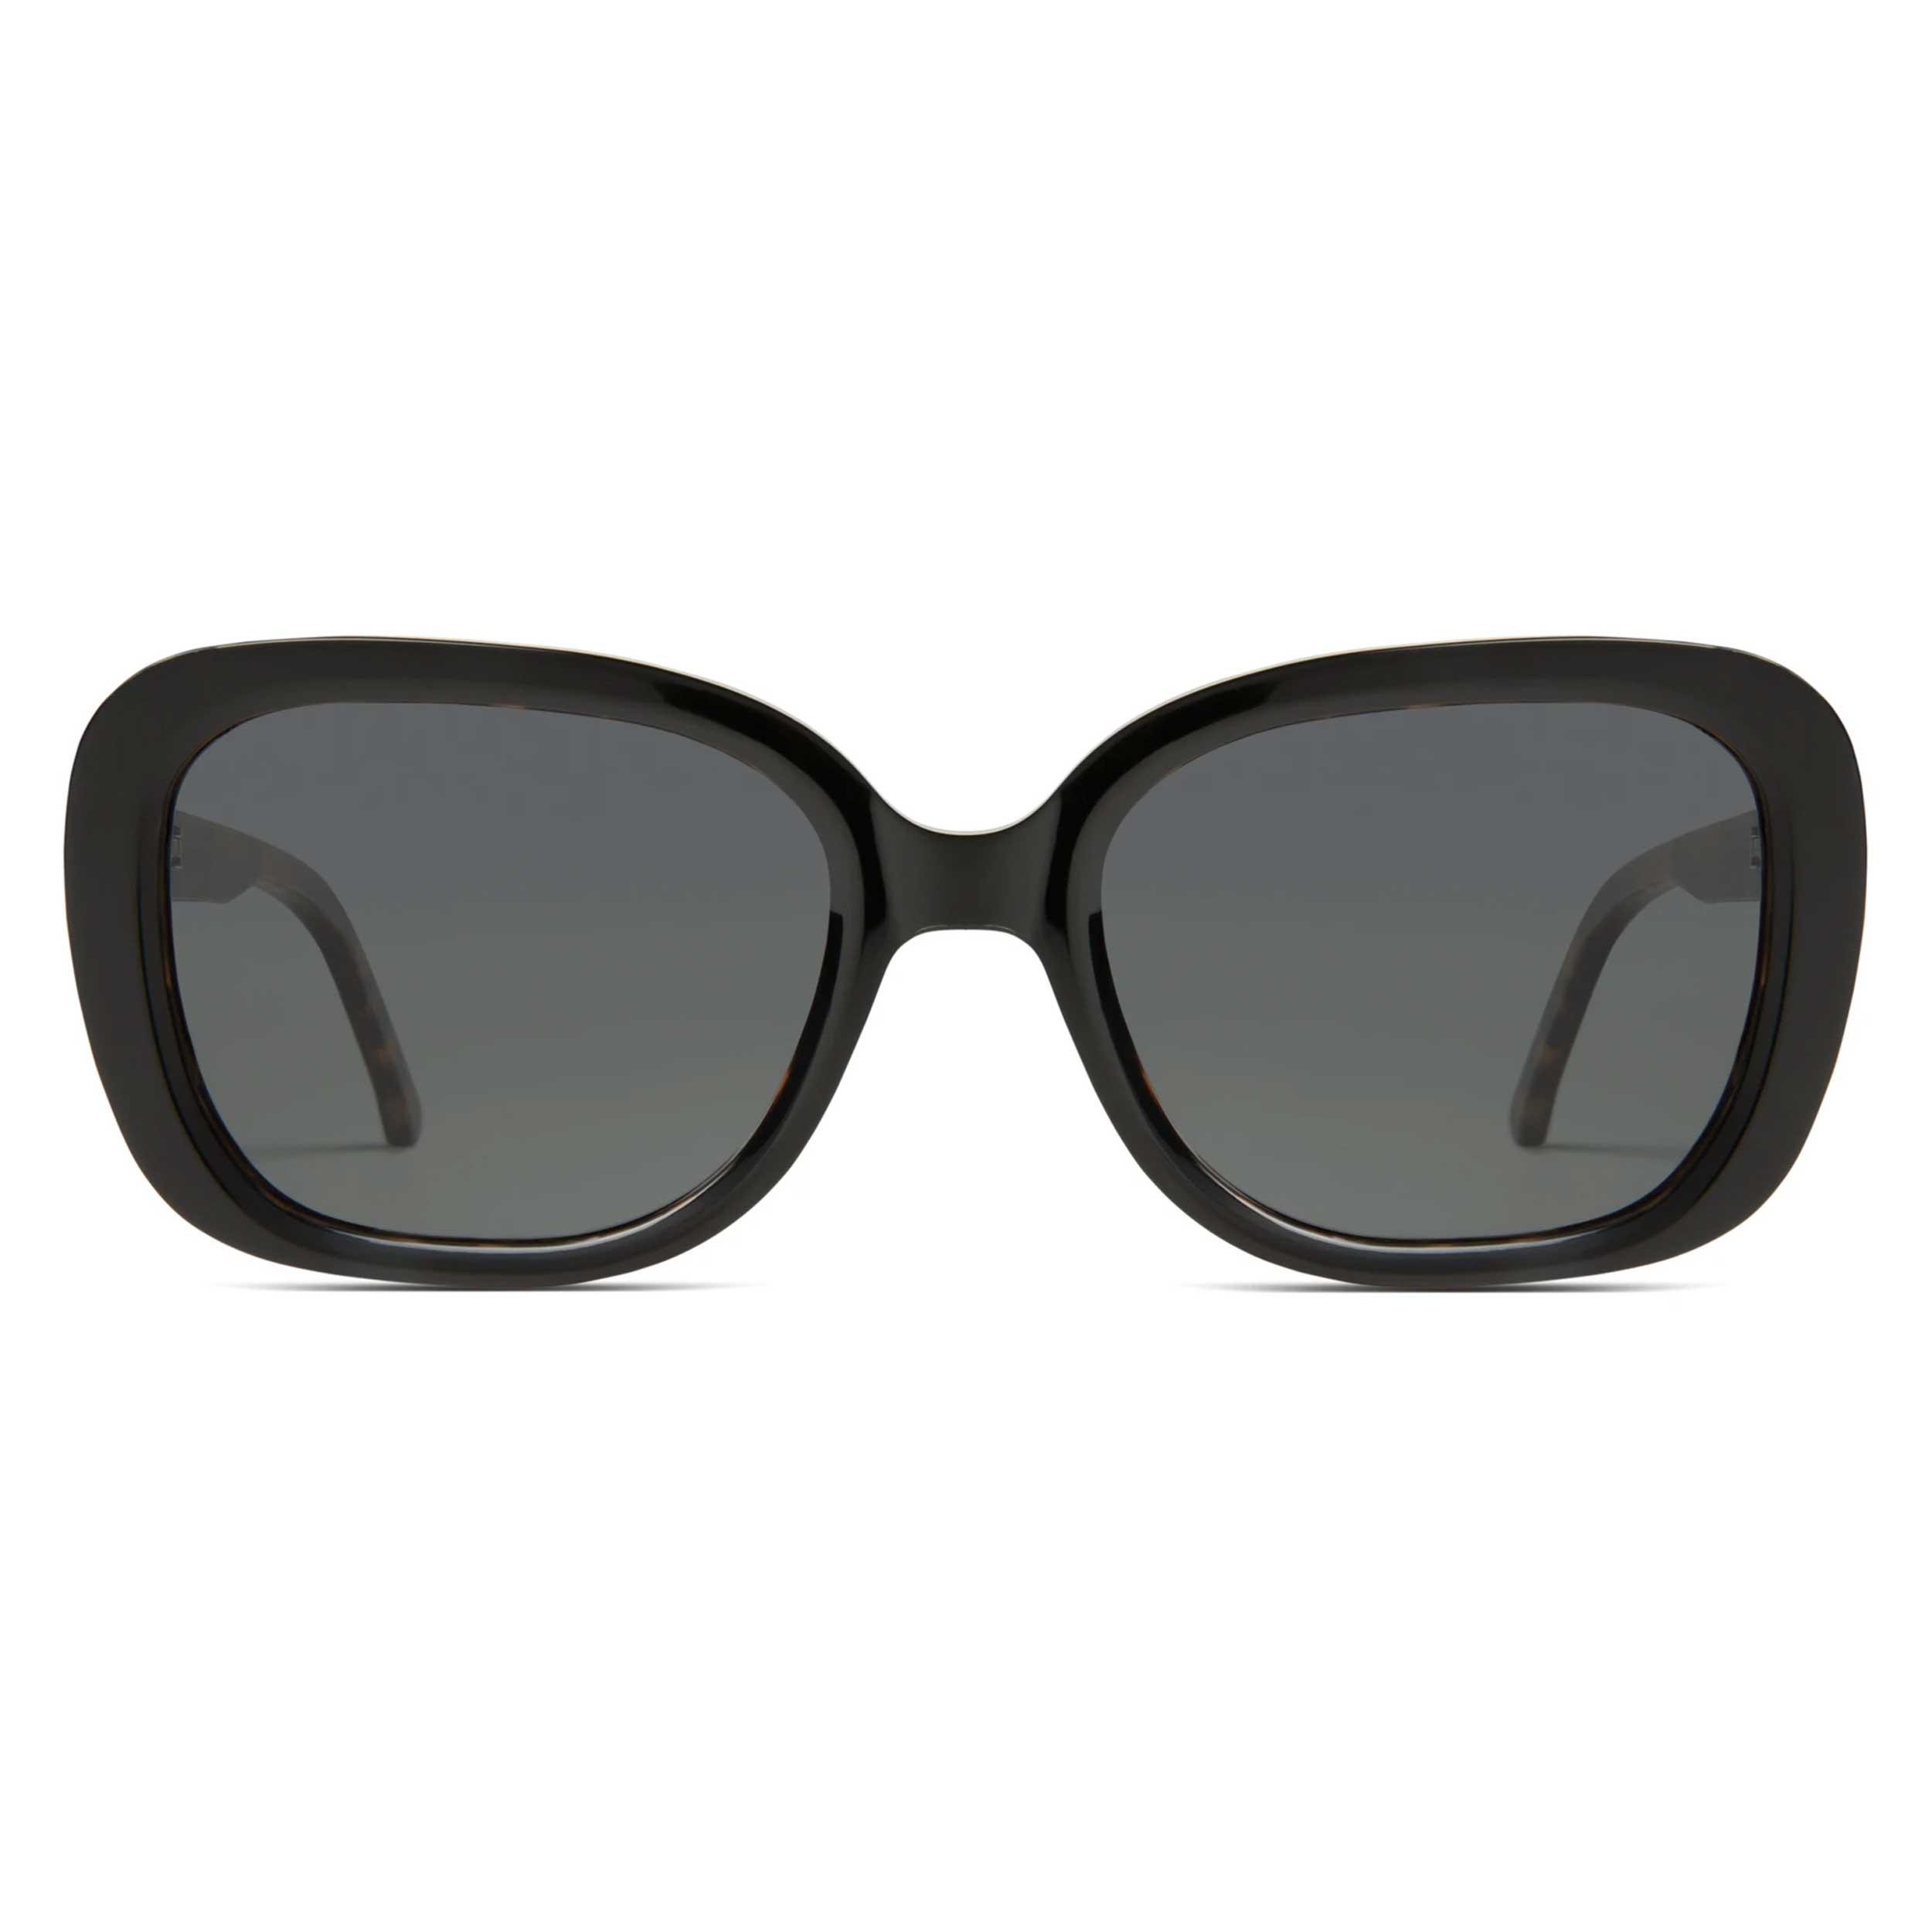 عینک آفتابی زنانه کومونو سری Cecile Black Tortoise مدل KOM-S3953